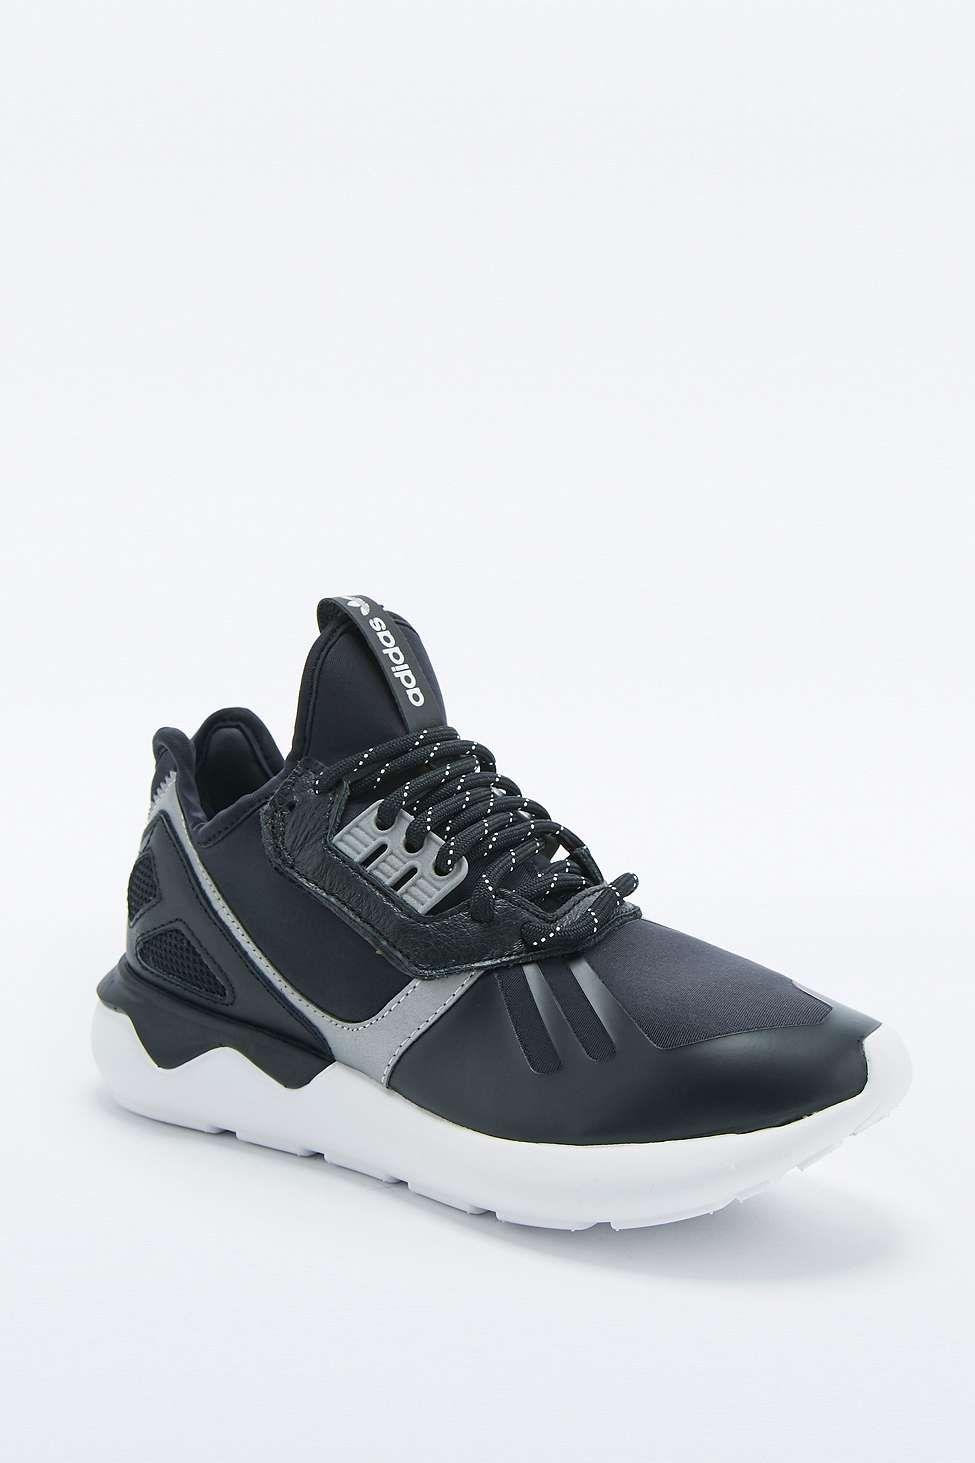 96685f10f0b0 adidas Originals Tubular 93 Black Trainers - Urban Outfitters ...